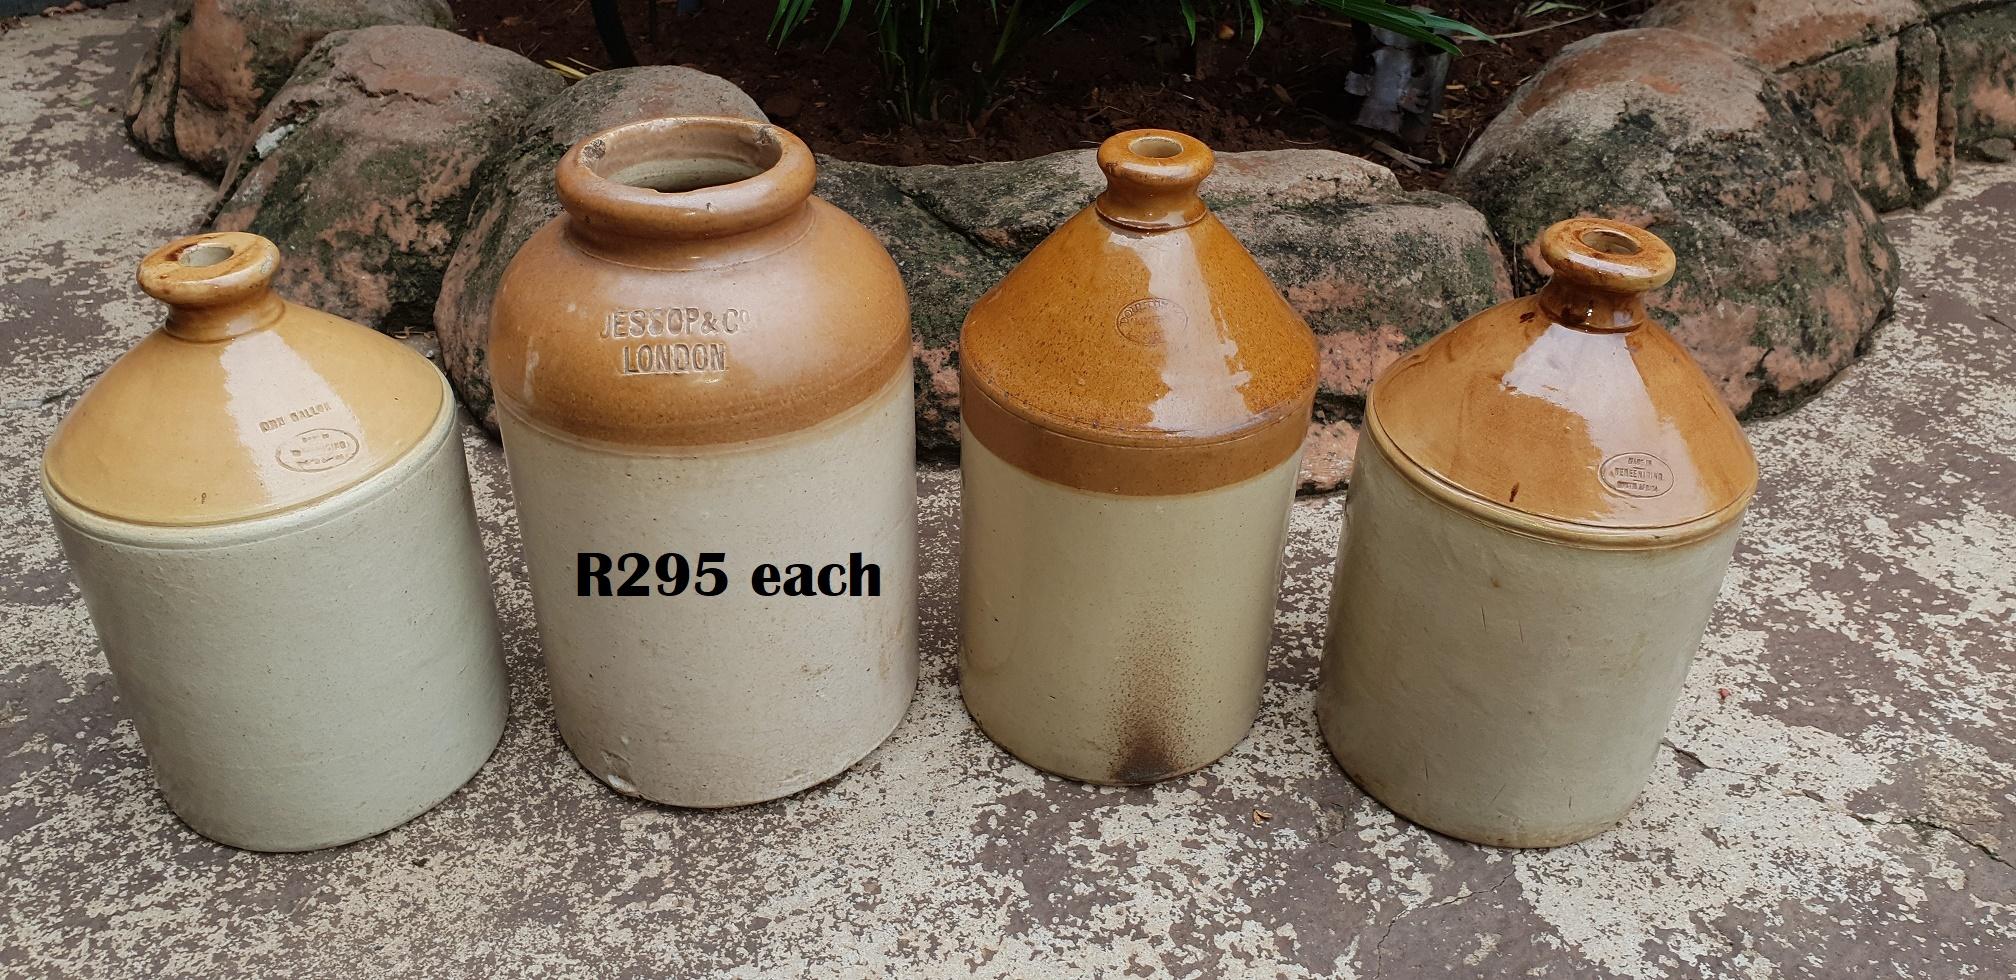 Antique Pottery Moonshine Decanters (R295 EACH)